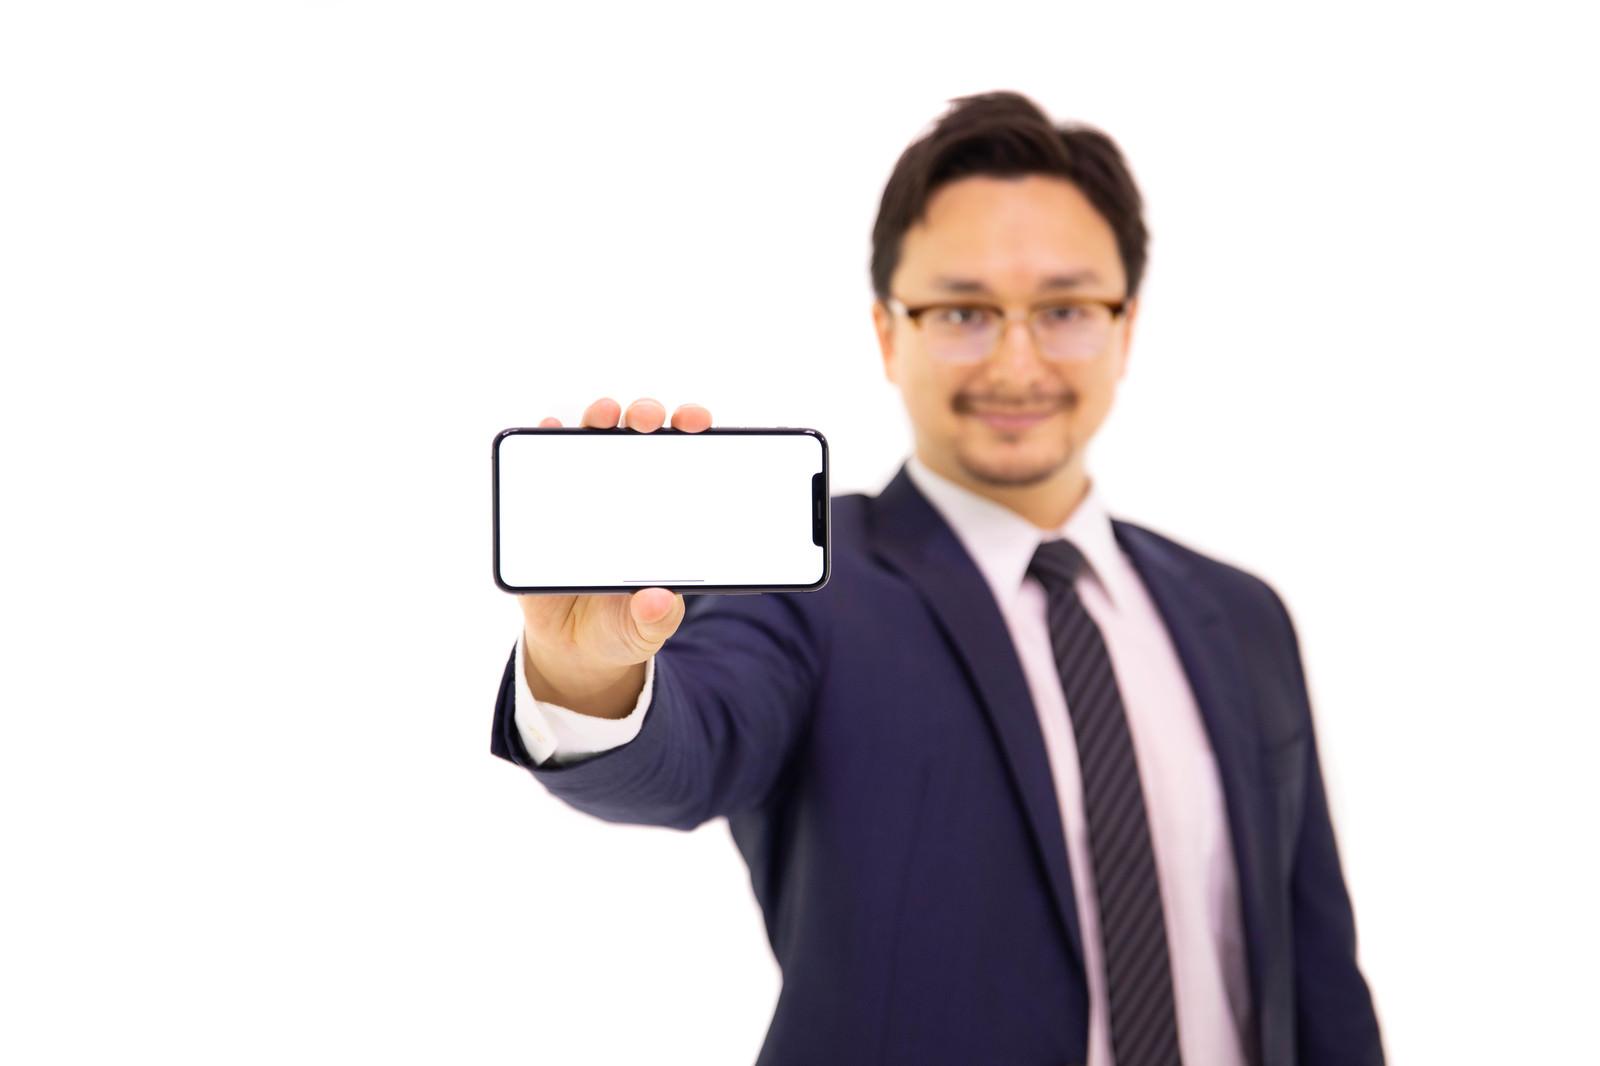 「XS MAXの大画面(6.5インチディスプレイ)を強調する外国人」の写真[モデル:Max_Ezaki]